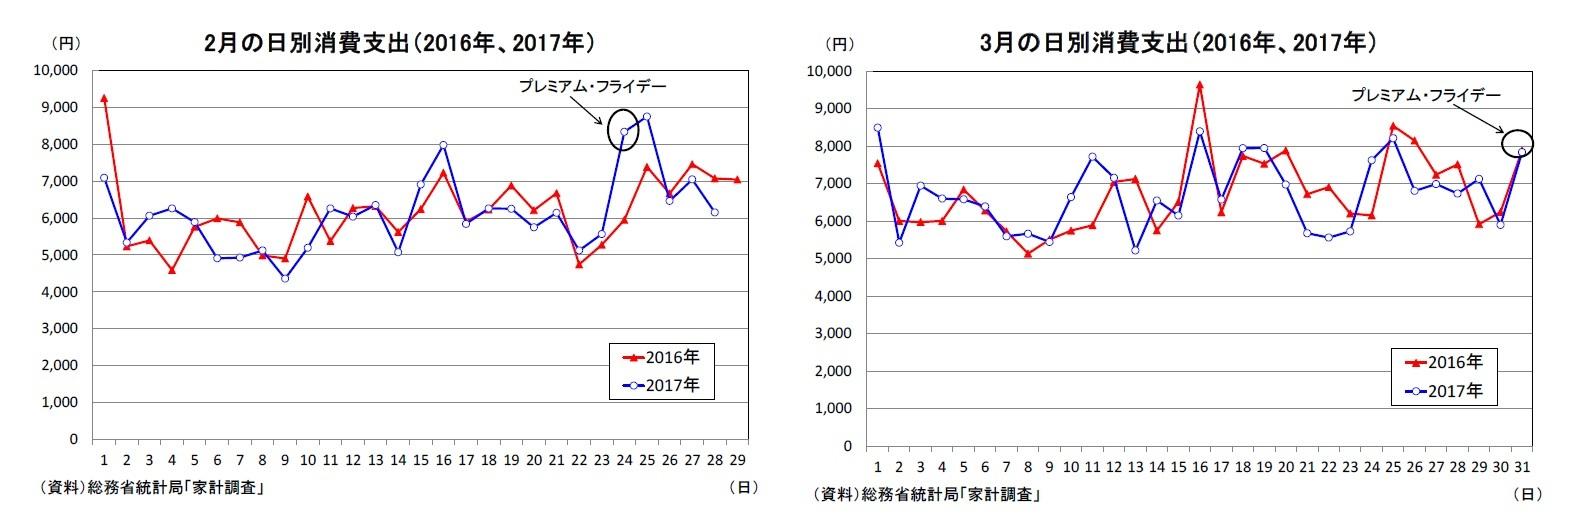 2月の日別消費支出(2016年、2017年)/3月の日別消費支出(2016年、2017年)